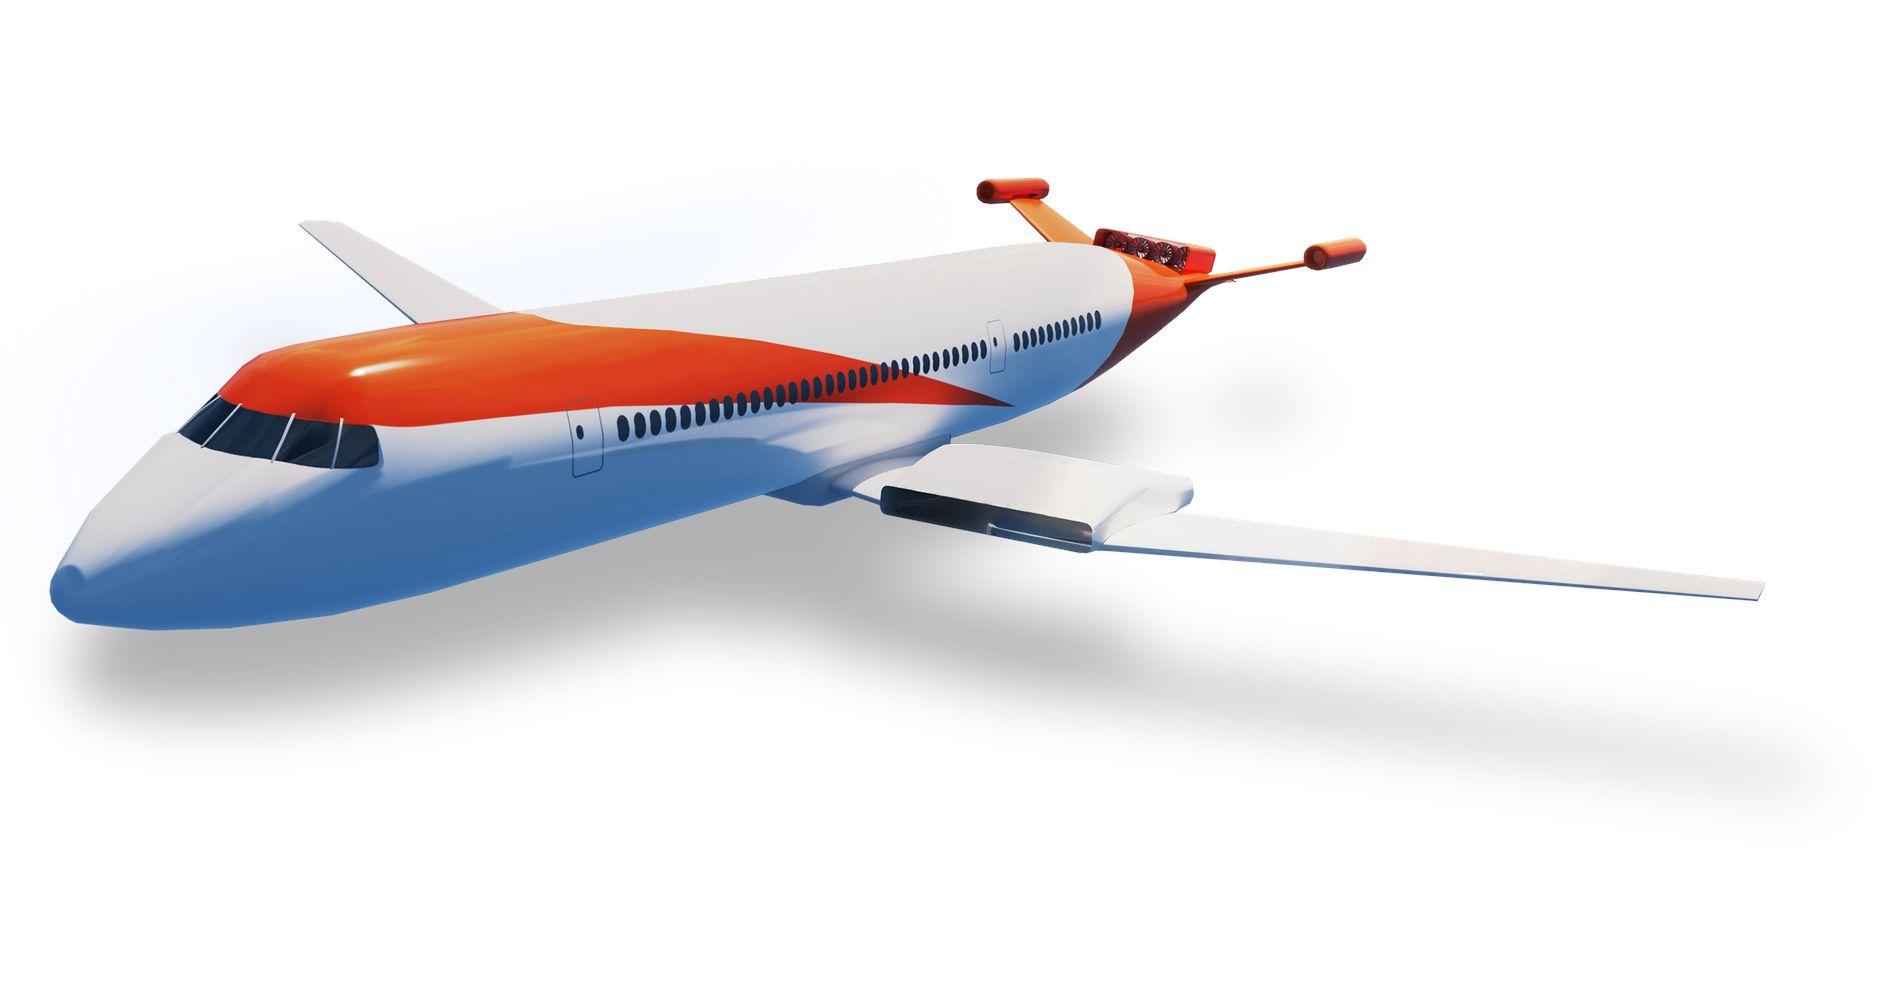 wright-electric-avion-ligne